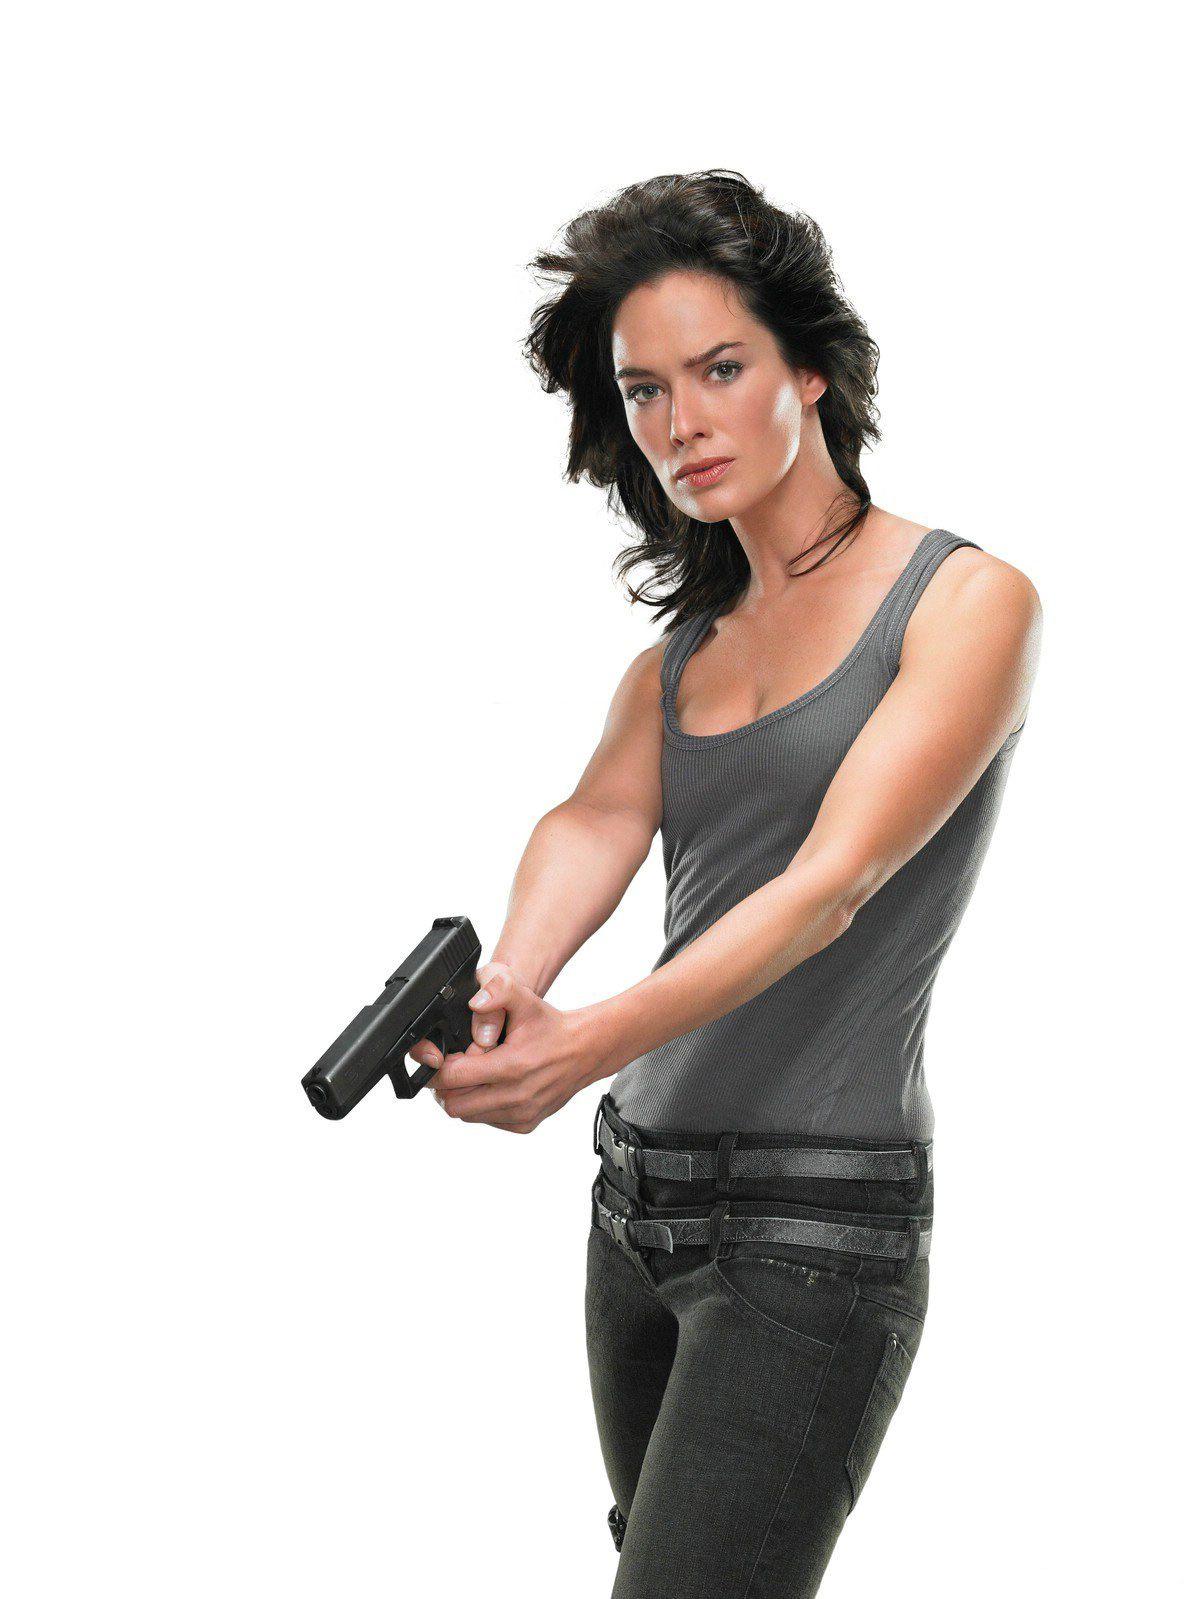 http://2.bp.blogspot.com/-rn5P2sqk2QA/T1Y3HZgyTDI/AAAAAAAAMWo/lGXSwOZB7zA/s1600/Terminator+-+The+Sarah+Connor+Chronicles+(3).jpg